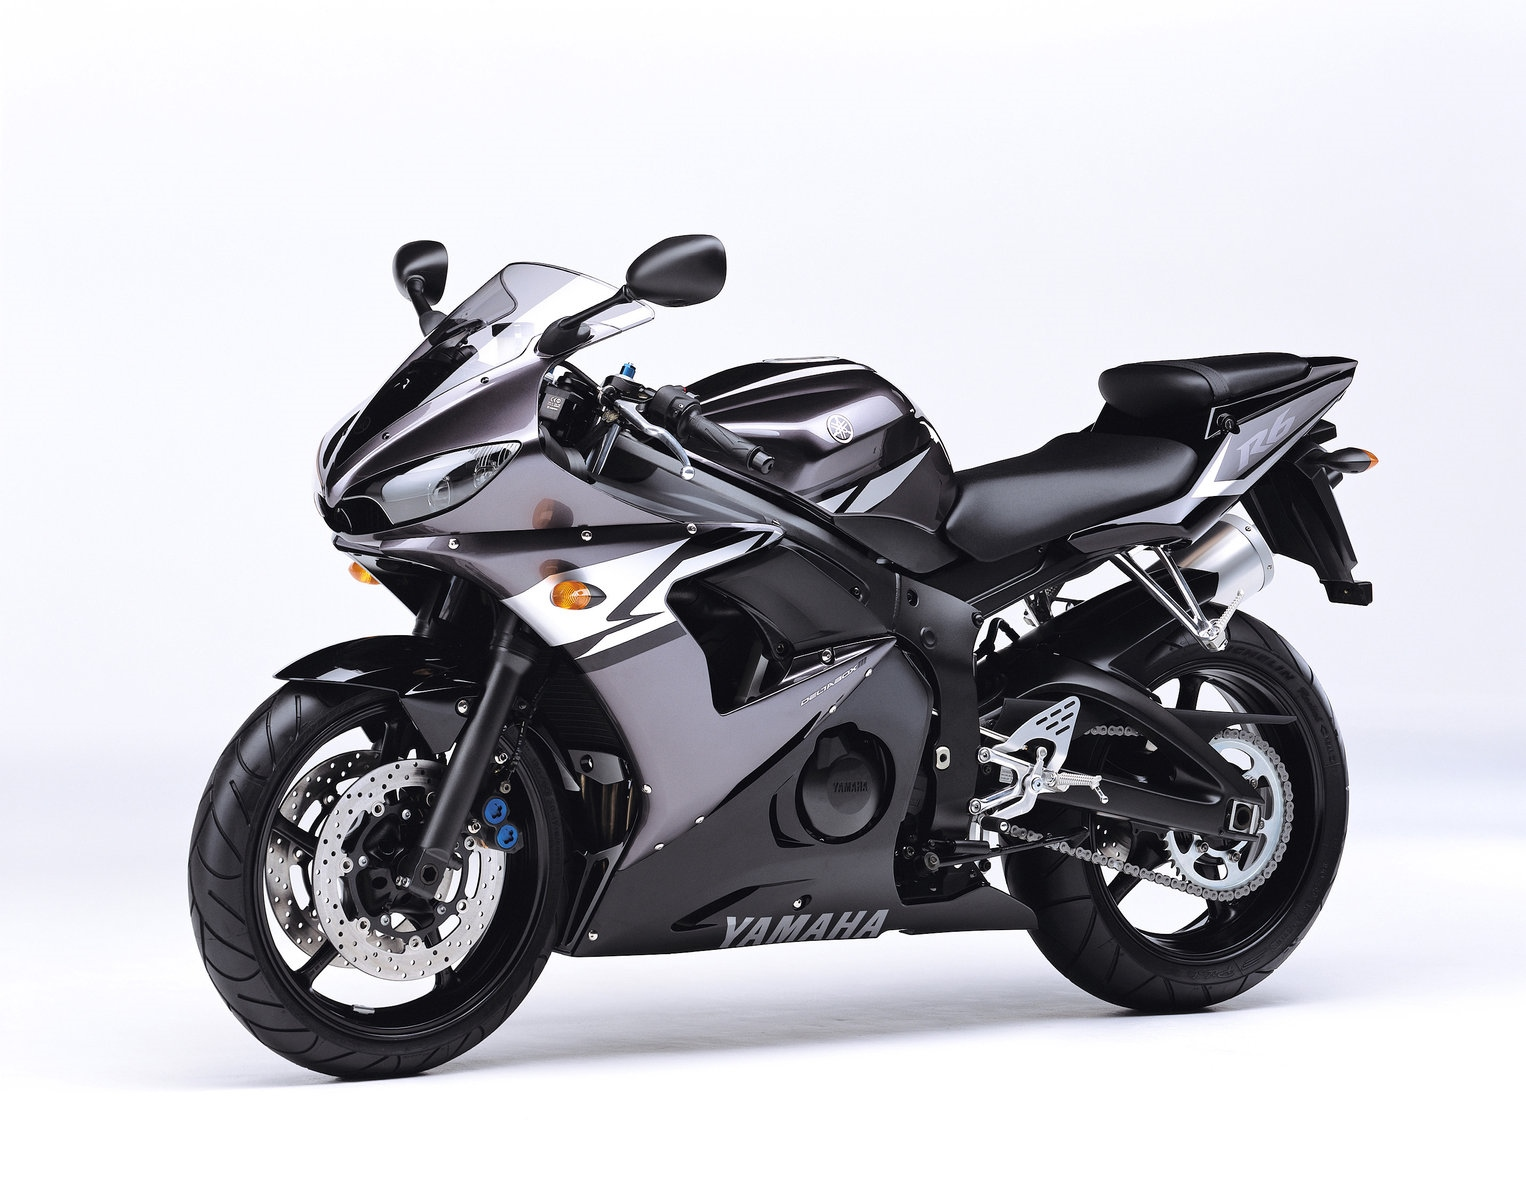 YAMAHA FZ6 (98CV) 2004 600 cm3 | moto roadster | 29 000 km